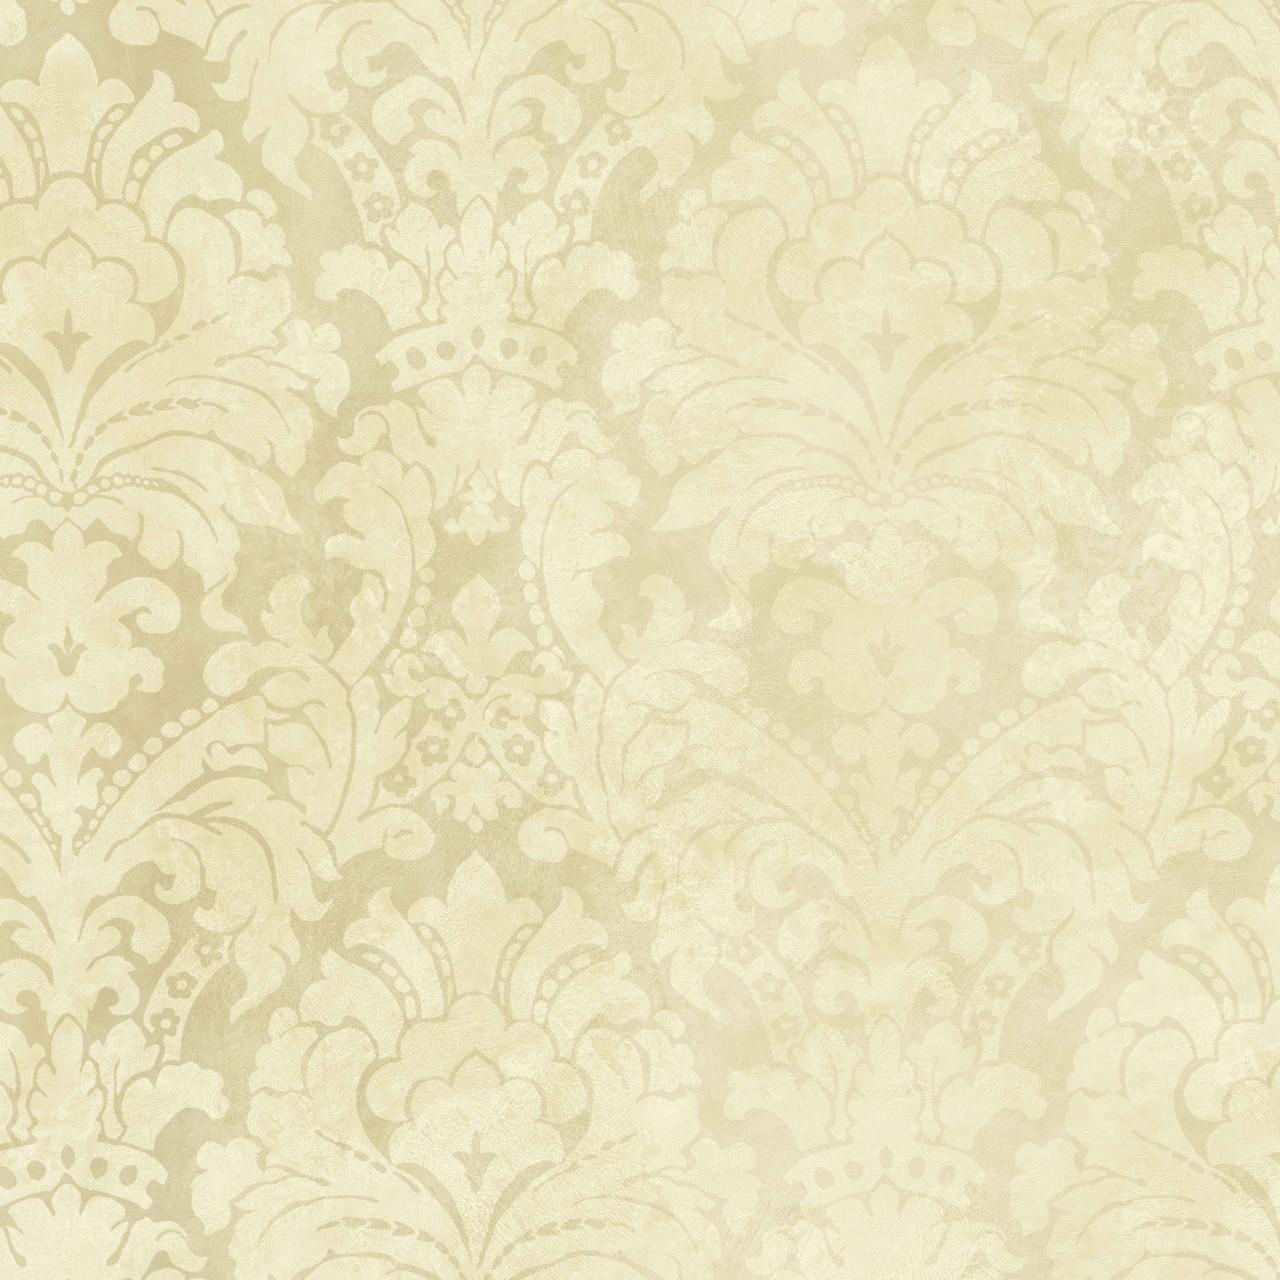 Tan Beige HAV40842 Palace Damask Wallpaper 1280x1280